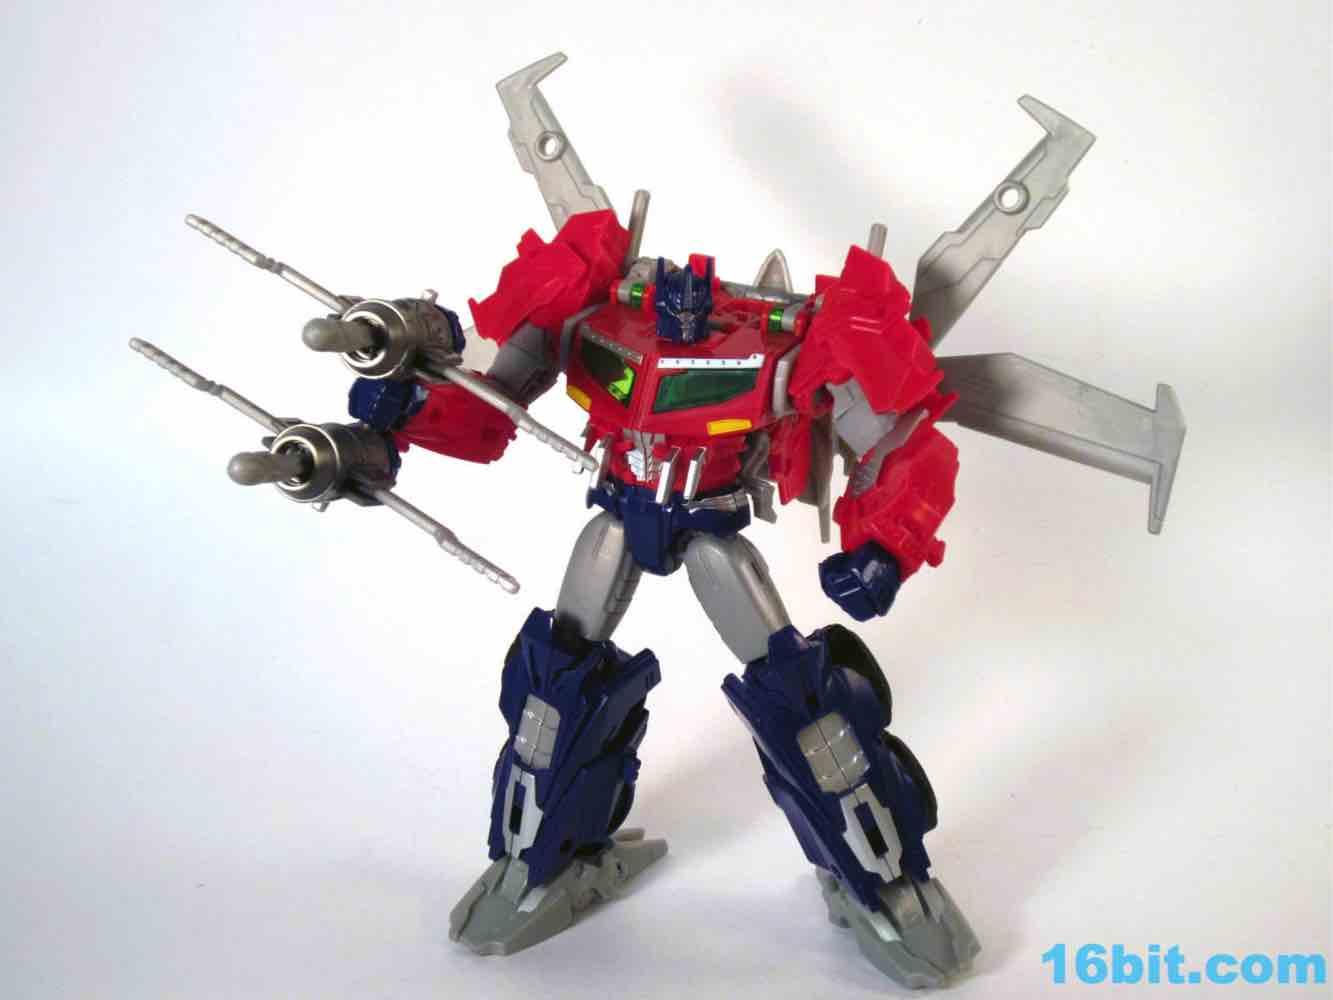 16bit.com Figure of the Day Review: Hasbro Transformers ...   1600 x 1200 jpeg 175kB